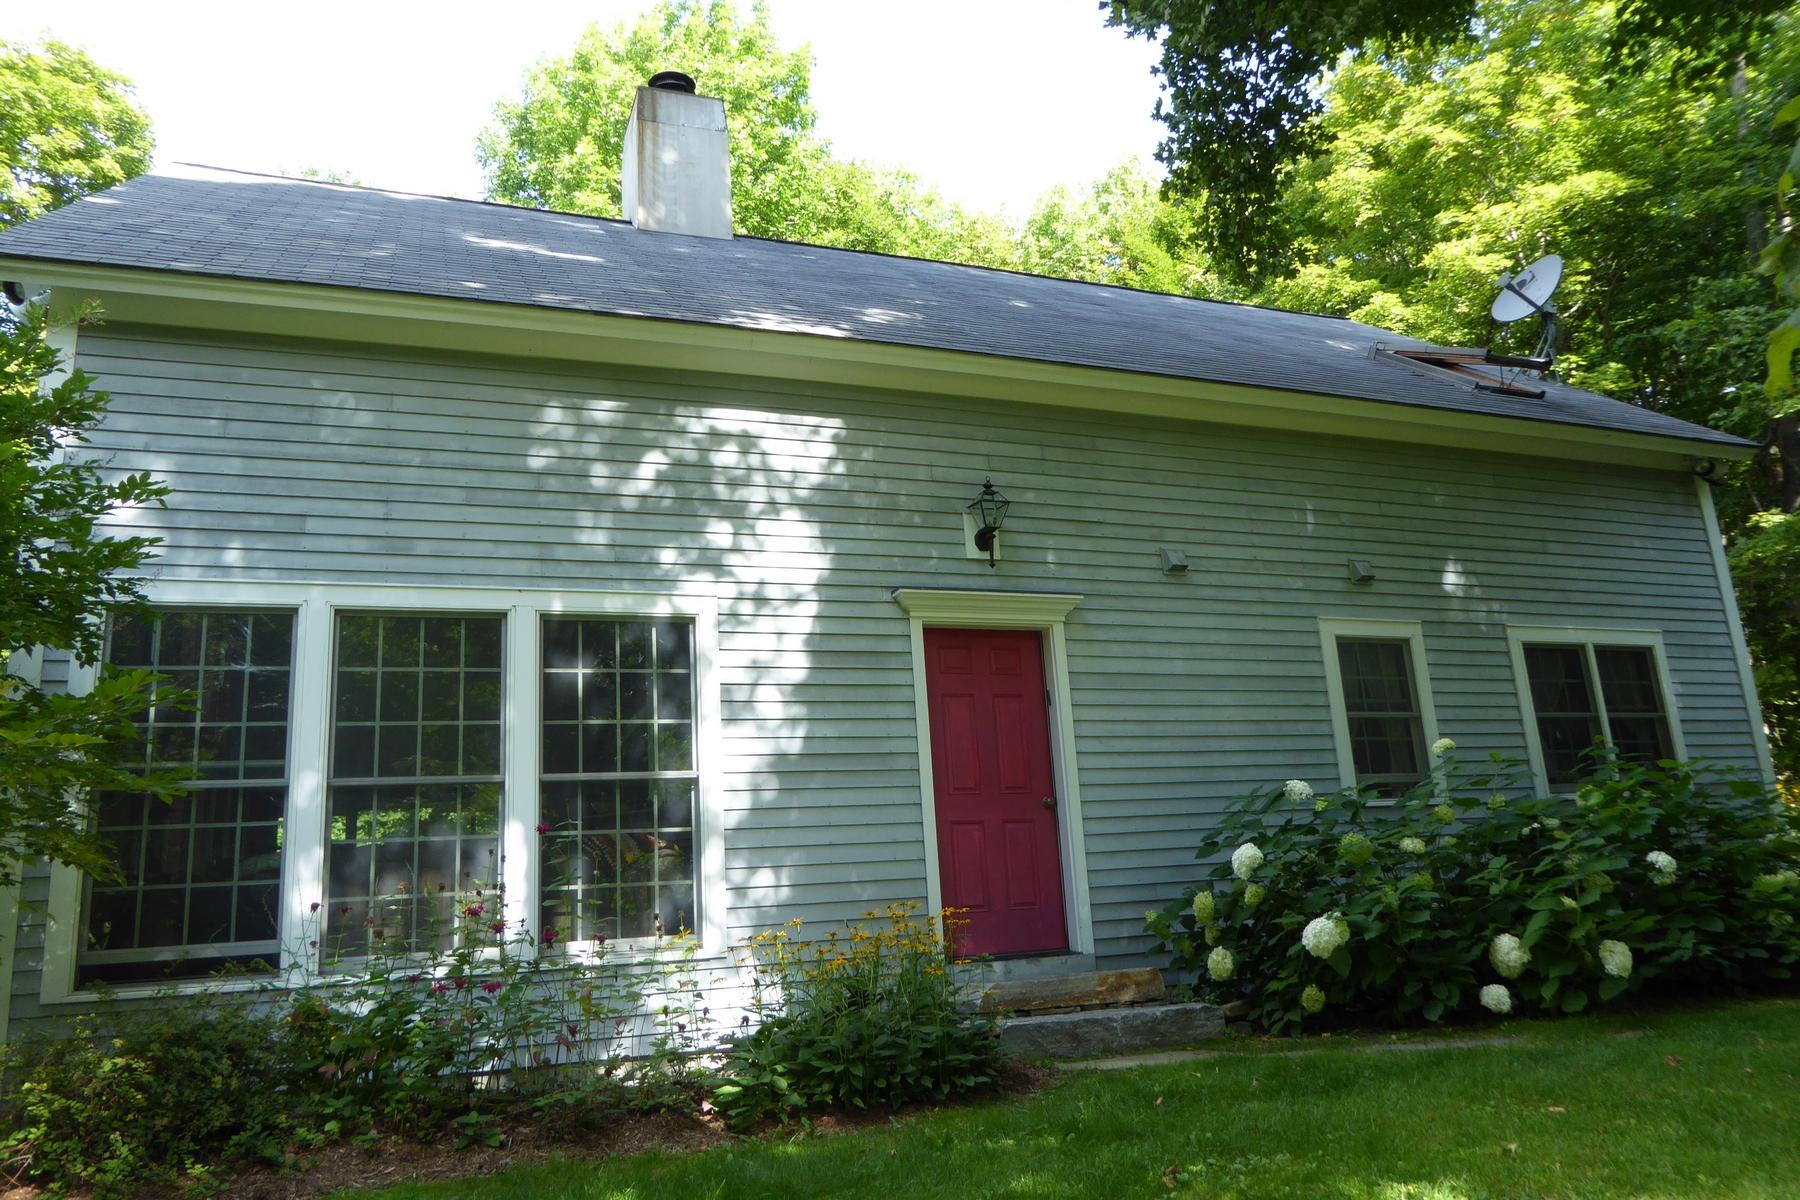 Moradia para Arrendamento às Close to Okemo & Bromley 533 Spruce Dr Andover, Vermont, 05143 Estados Unidos